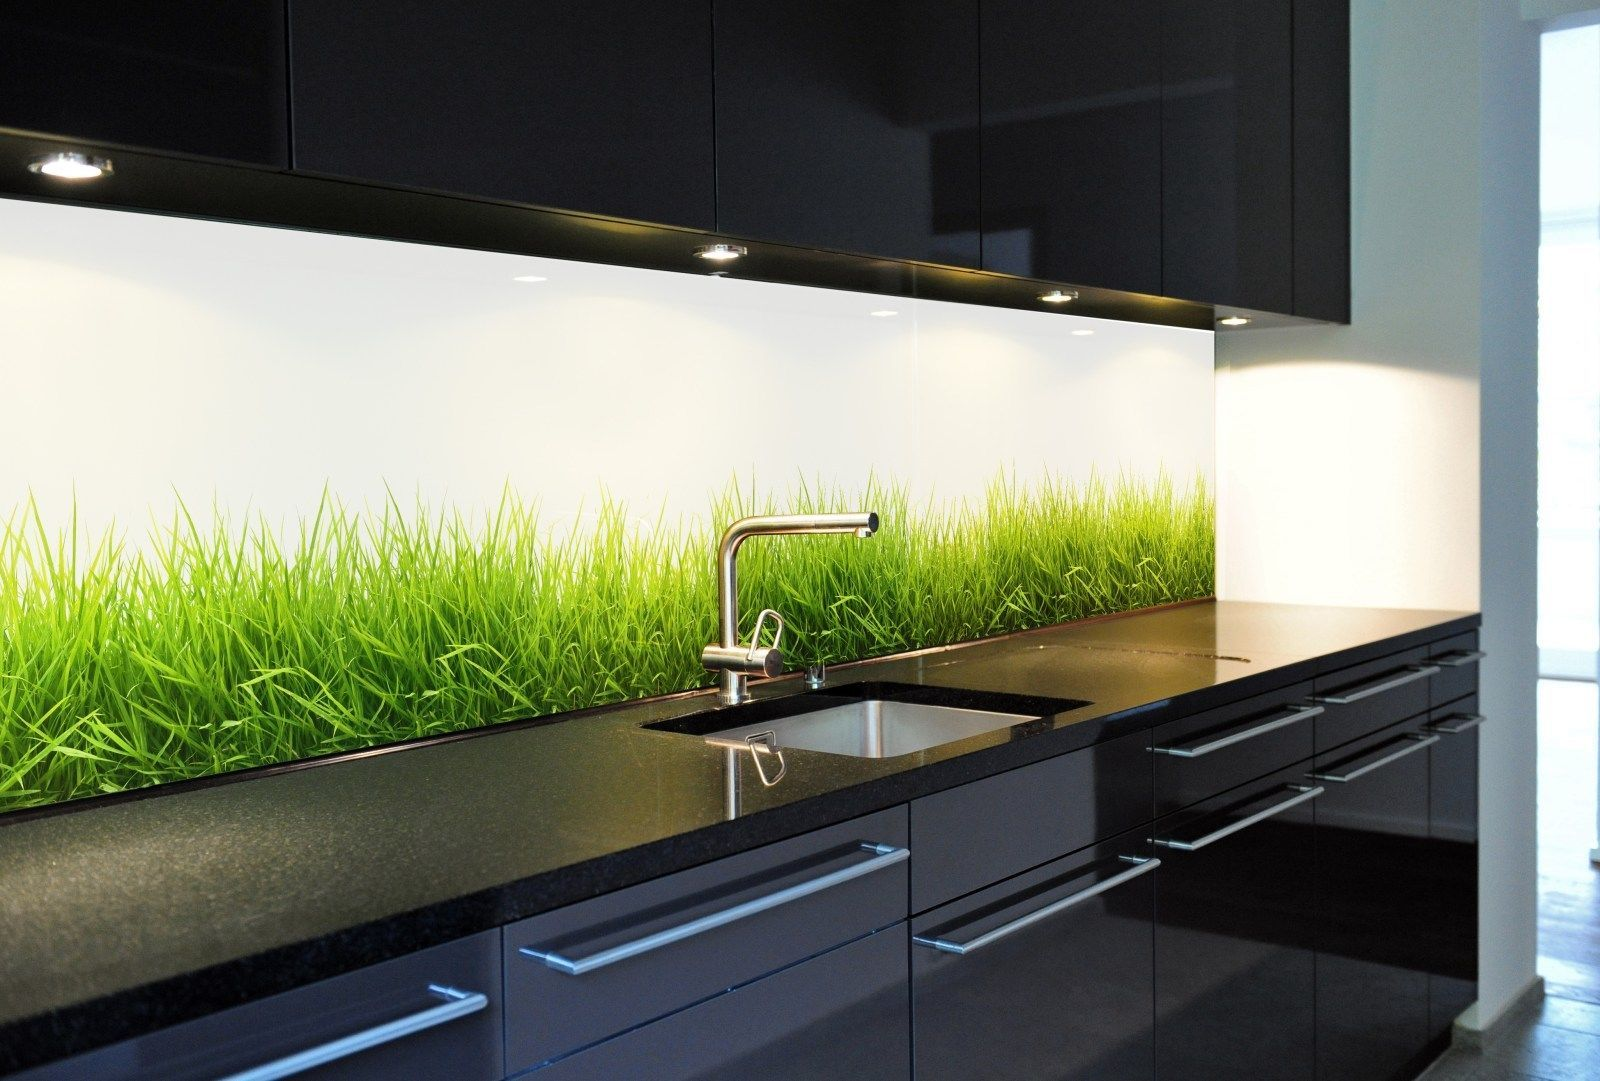 Kchenrckwand aus Glas Motiv Gras endlos verlegbar